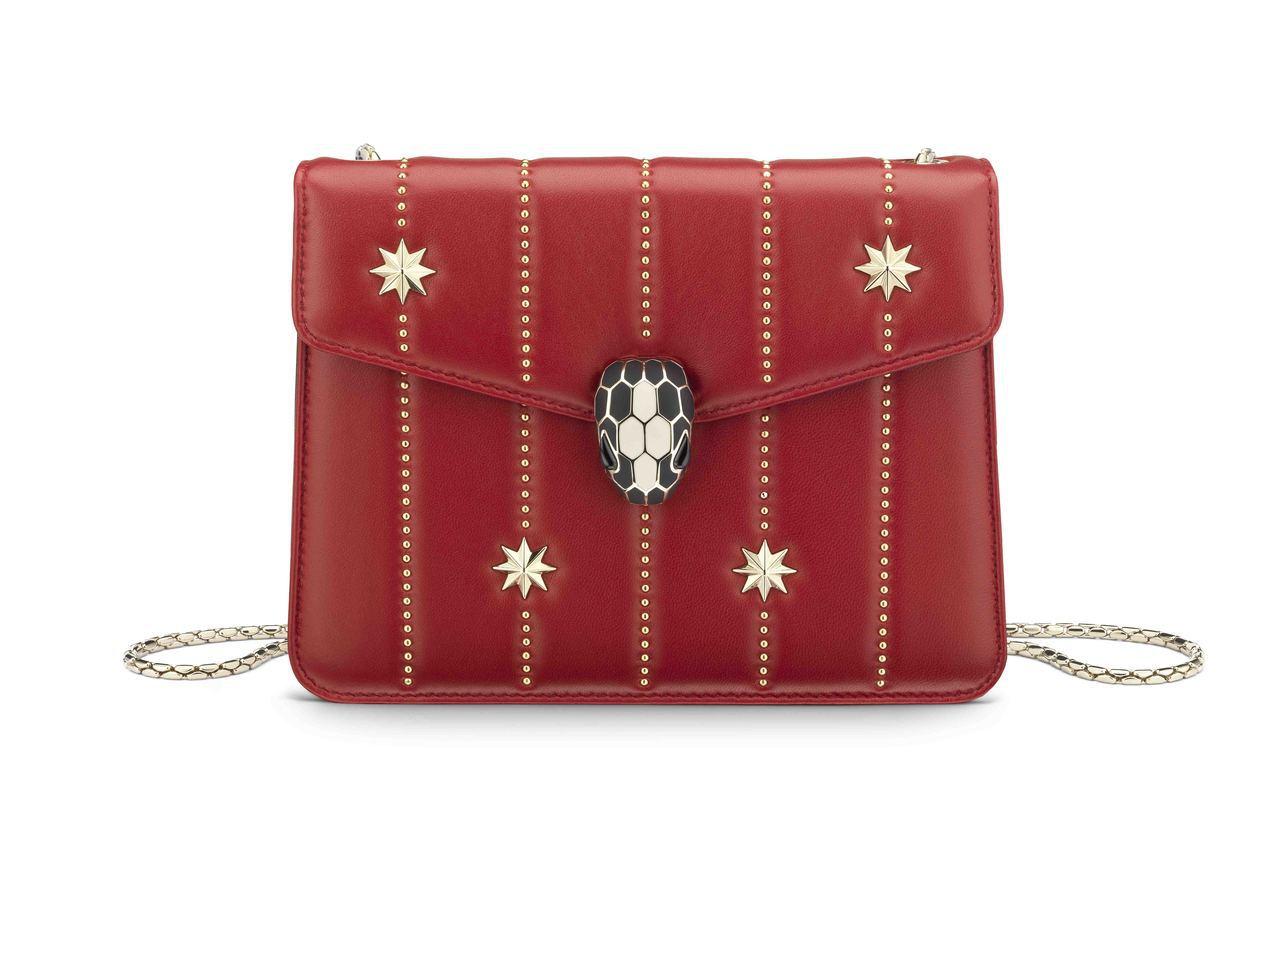 SERPENTI FOREVER冬季佳節系列紅寶色小羊皮肩背包,約75,500元...